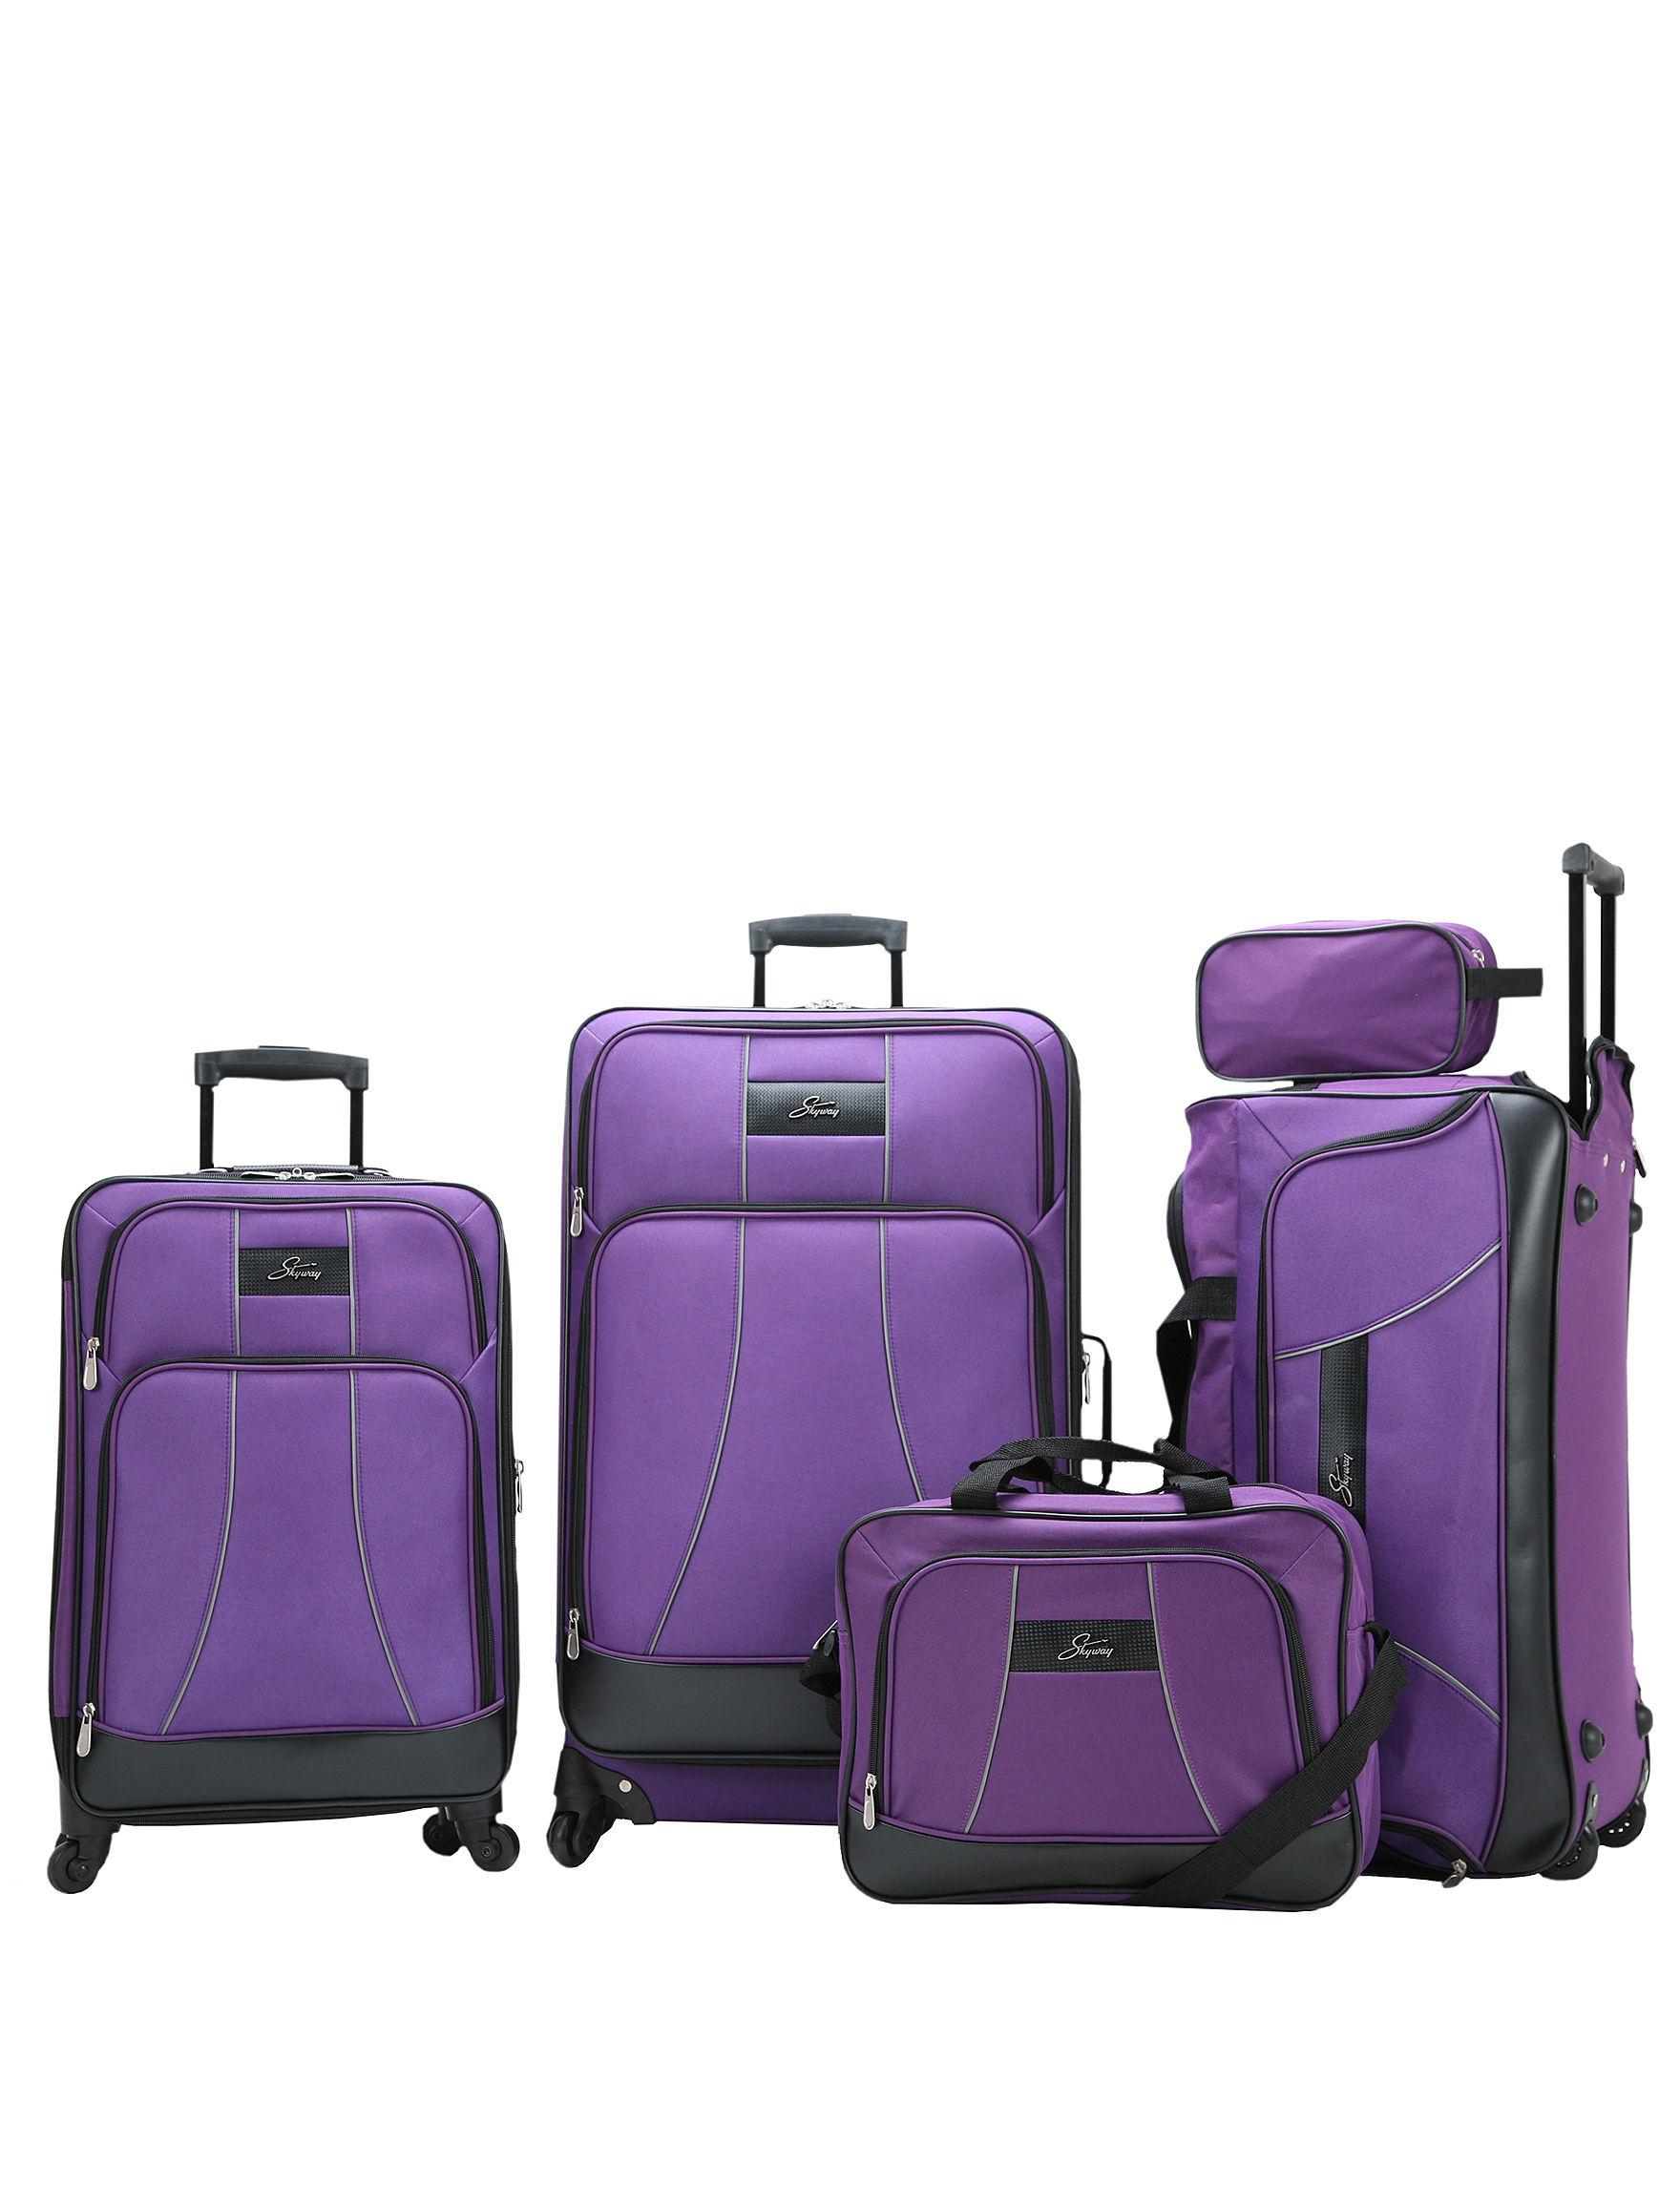 Skyway Purple Luggage Sets